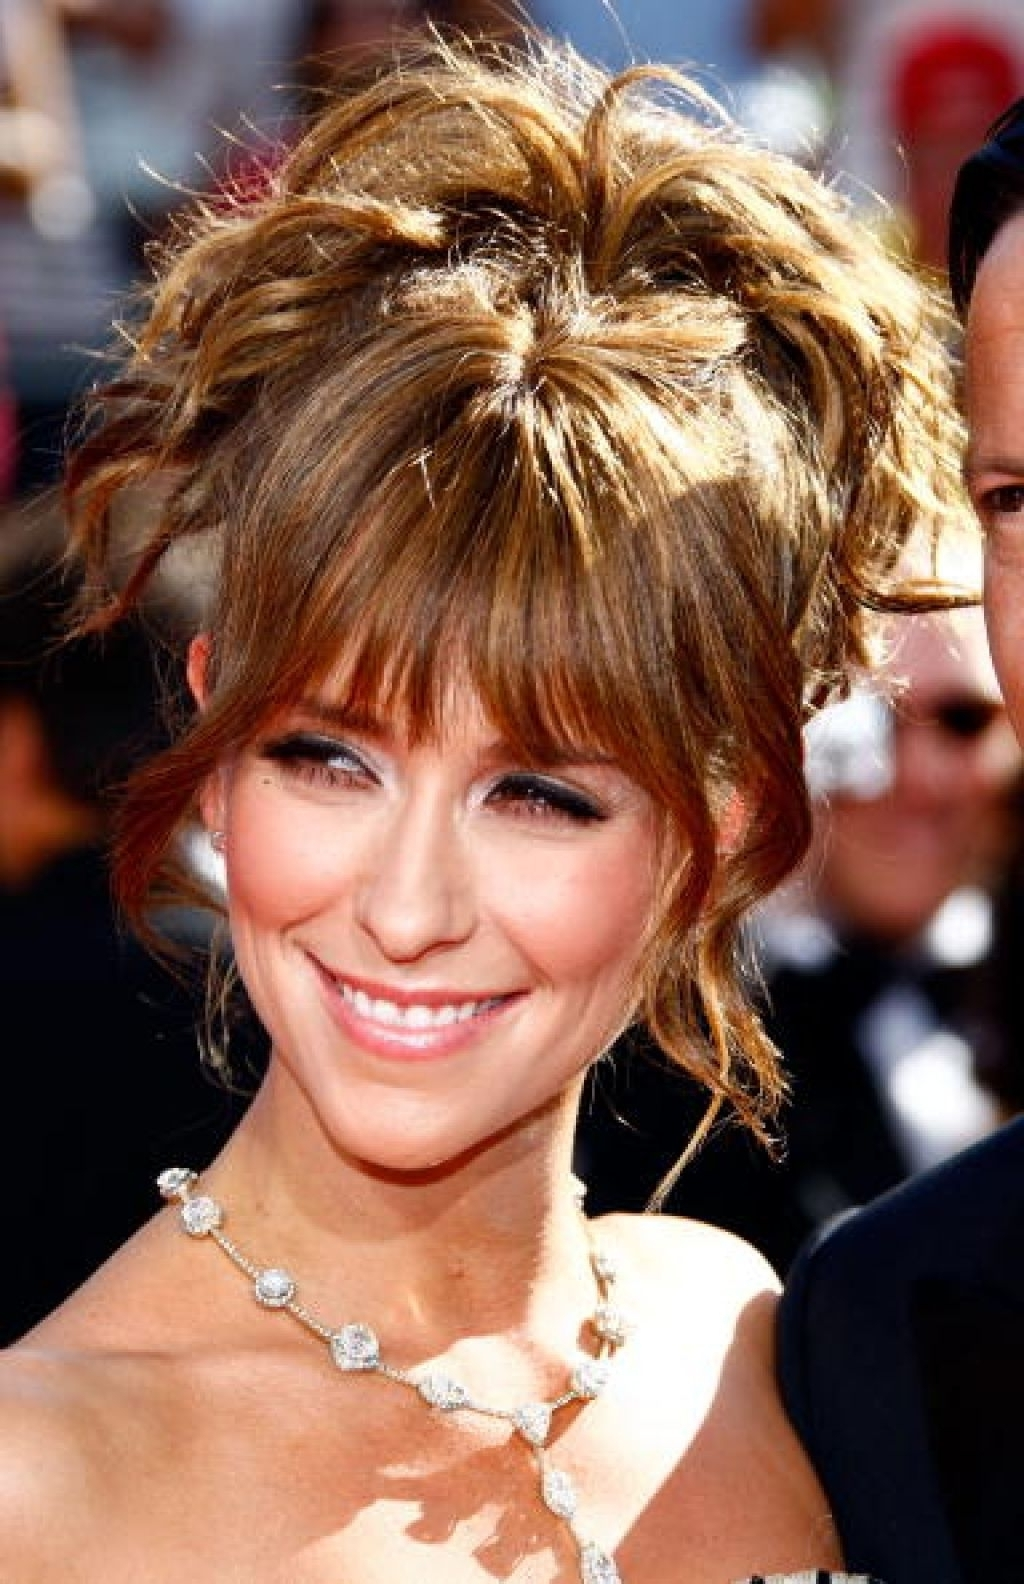 Updo Hairstyles With Bangs – Women Medium Haircut Within Updo Hairstyles With Bangs (View 12 of 15)